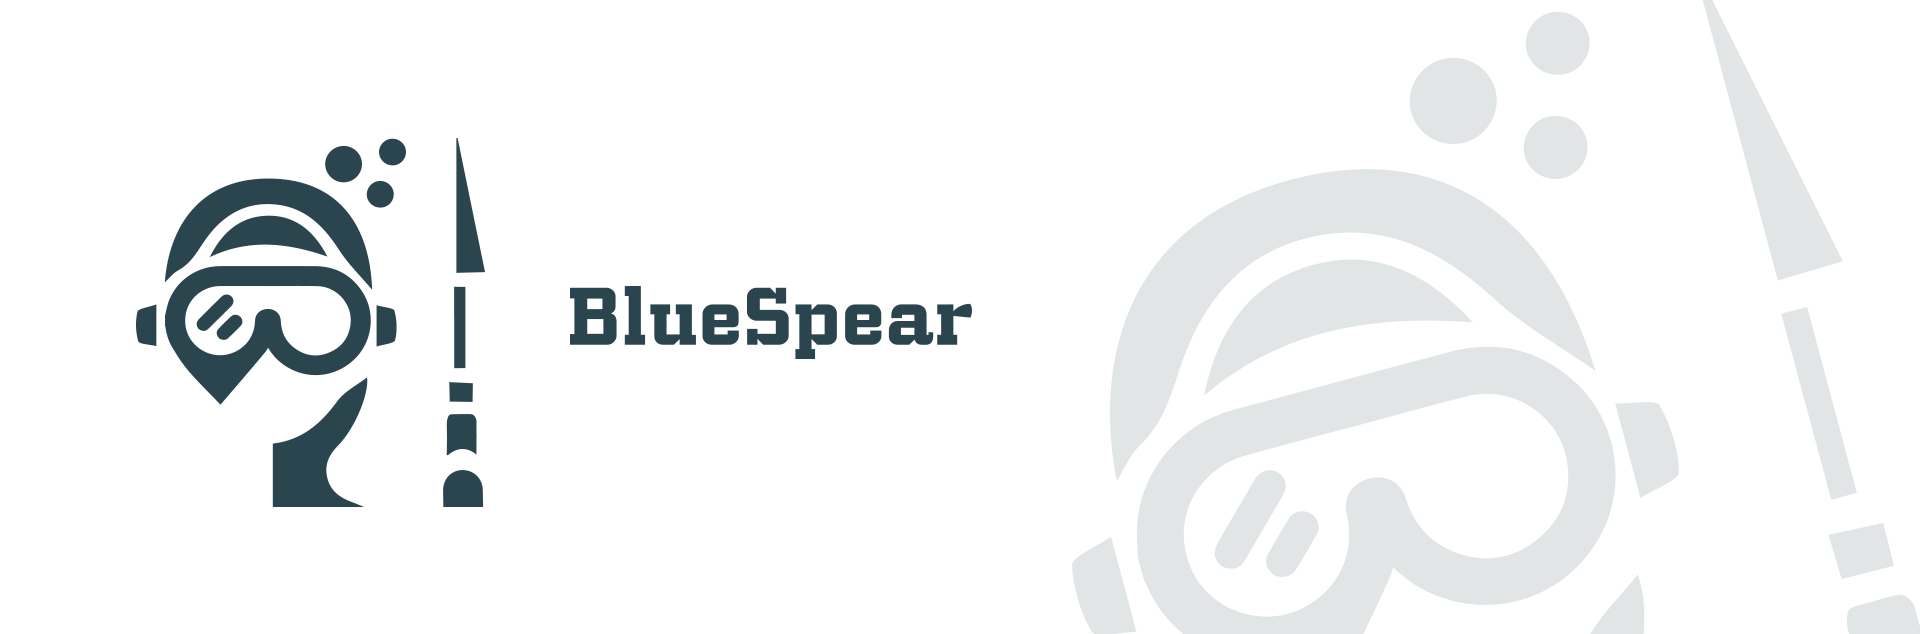 BlueSpear mobile app - icons & colours